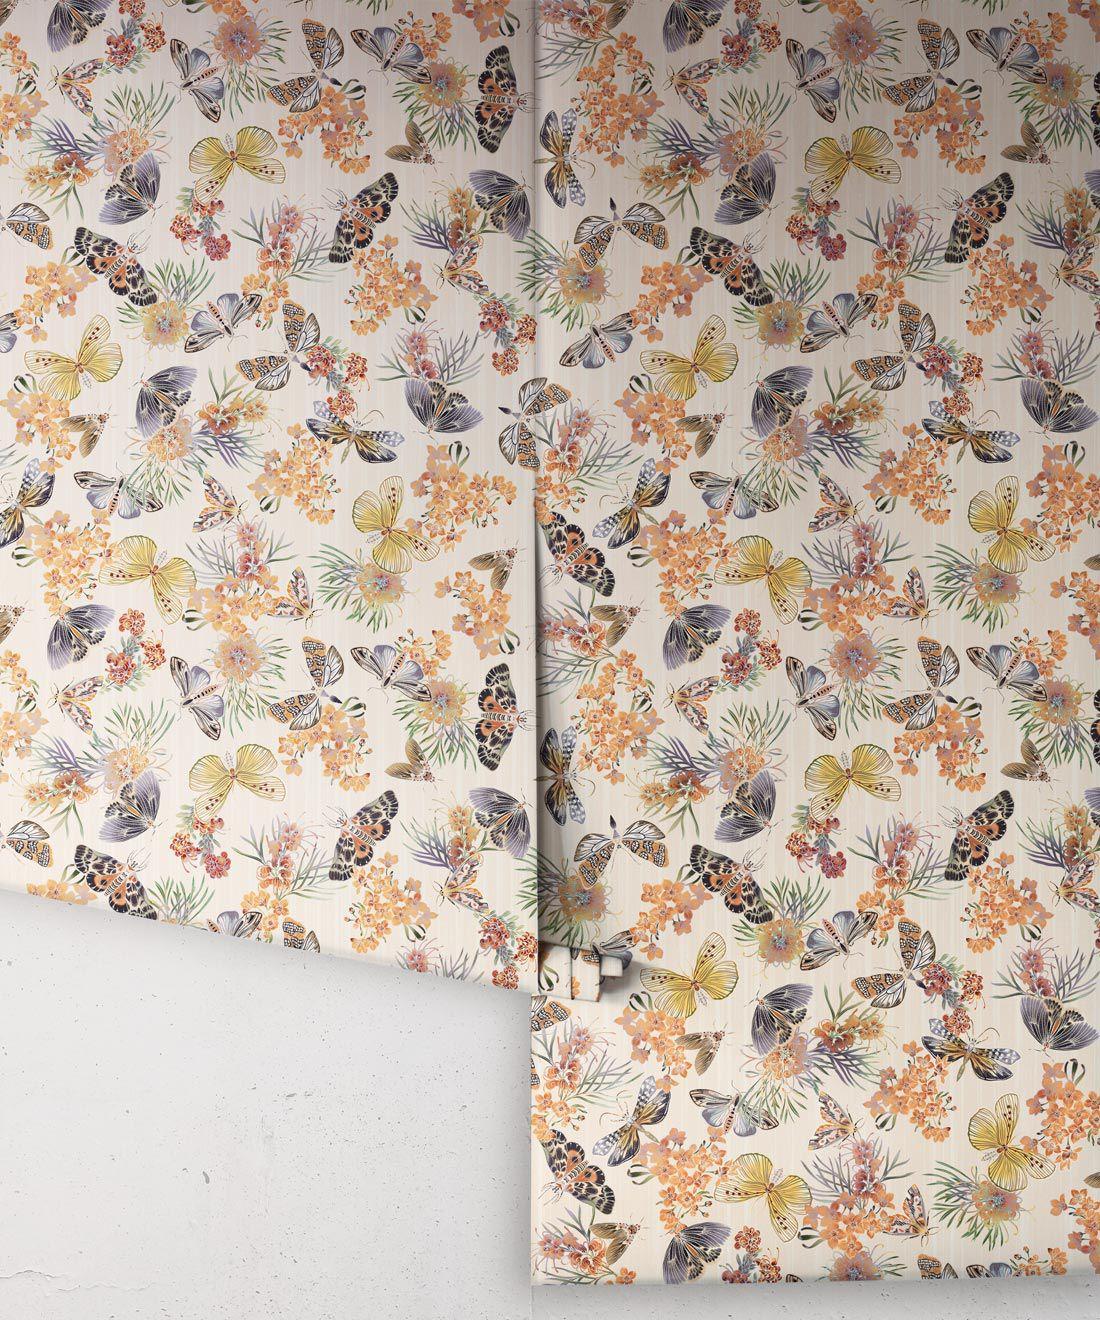 Moth Wallpaper • Eloise Short • Vintage Floral Wallpaper •Granny Chic Wallpaper • Grandmillennial Style Wallpaper •Ivory •Rolls